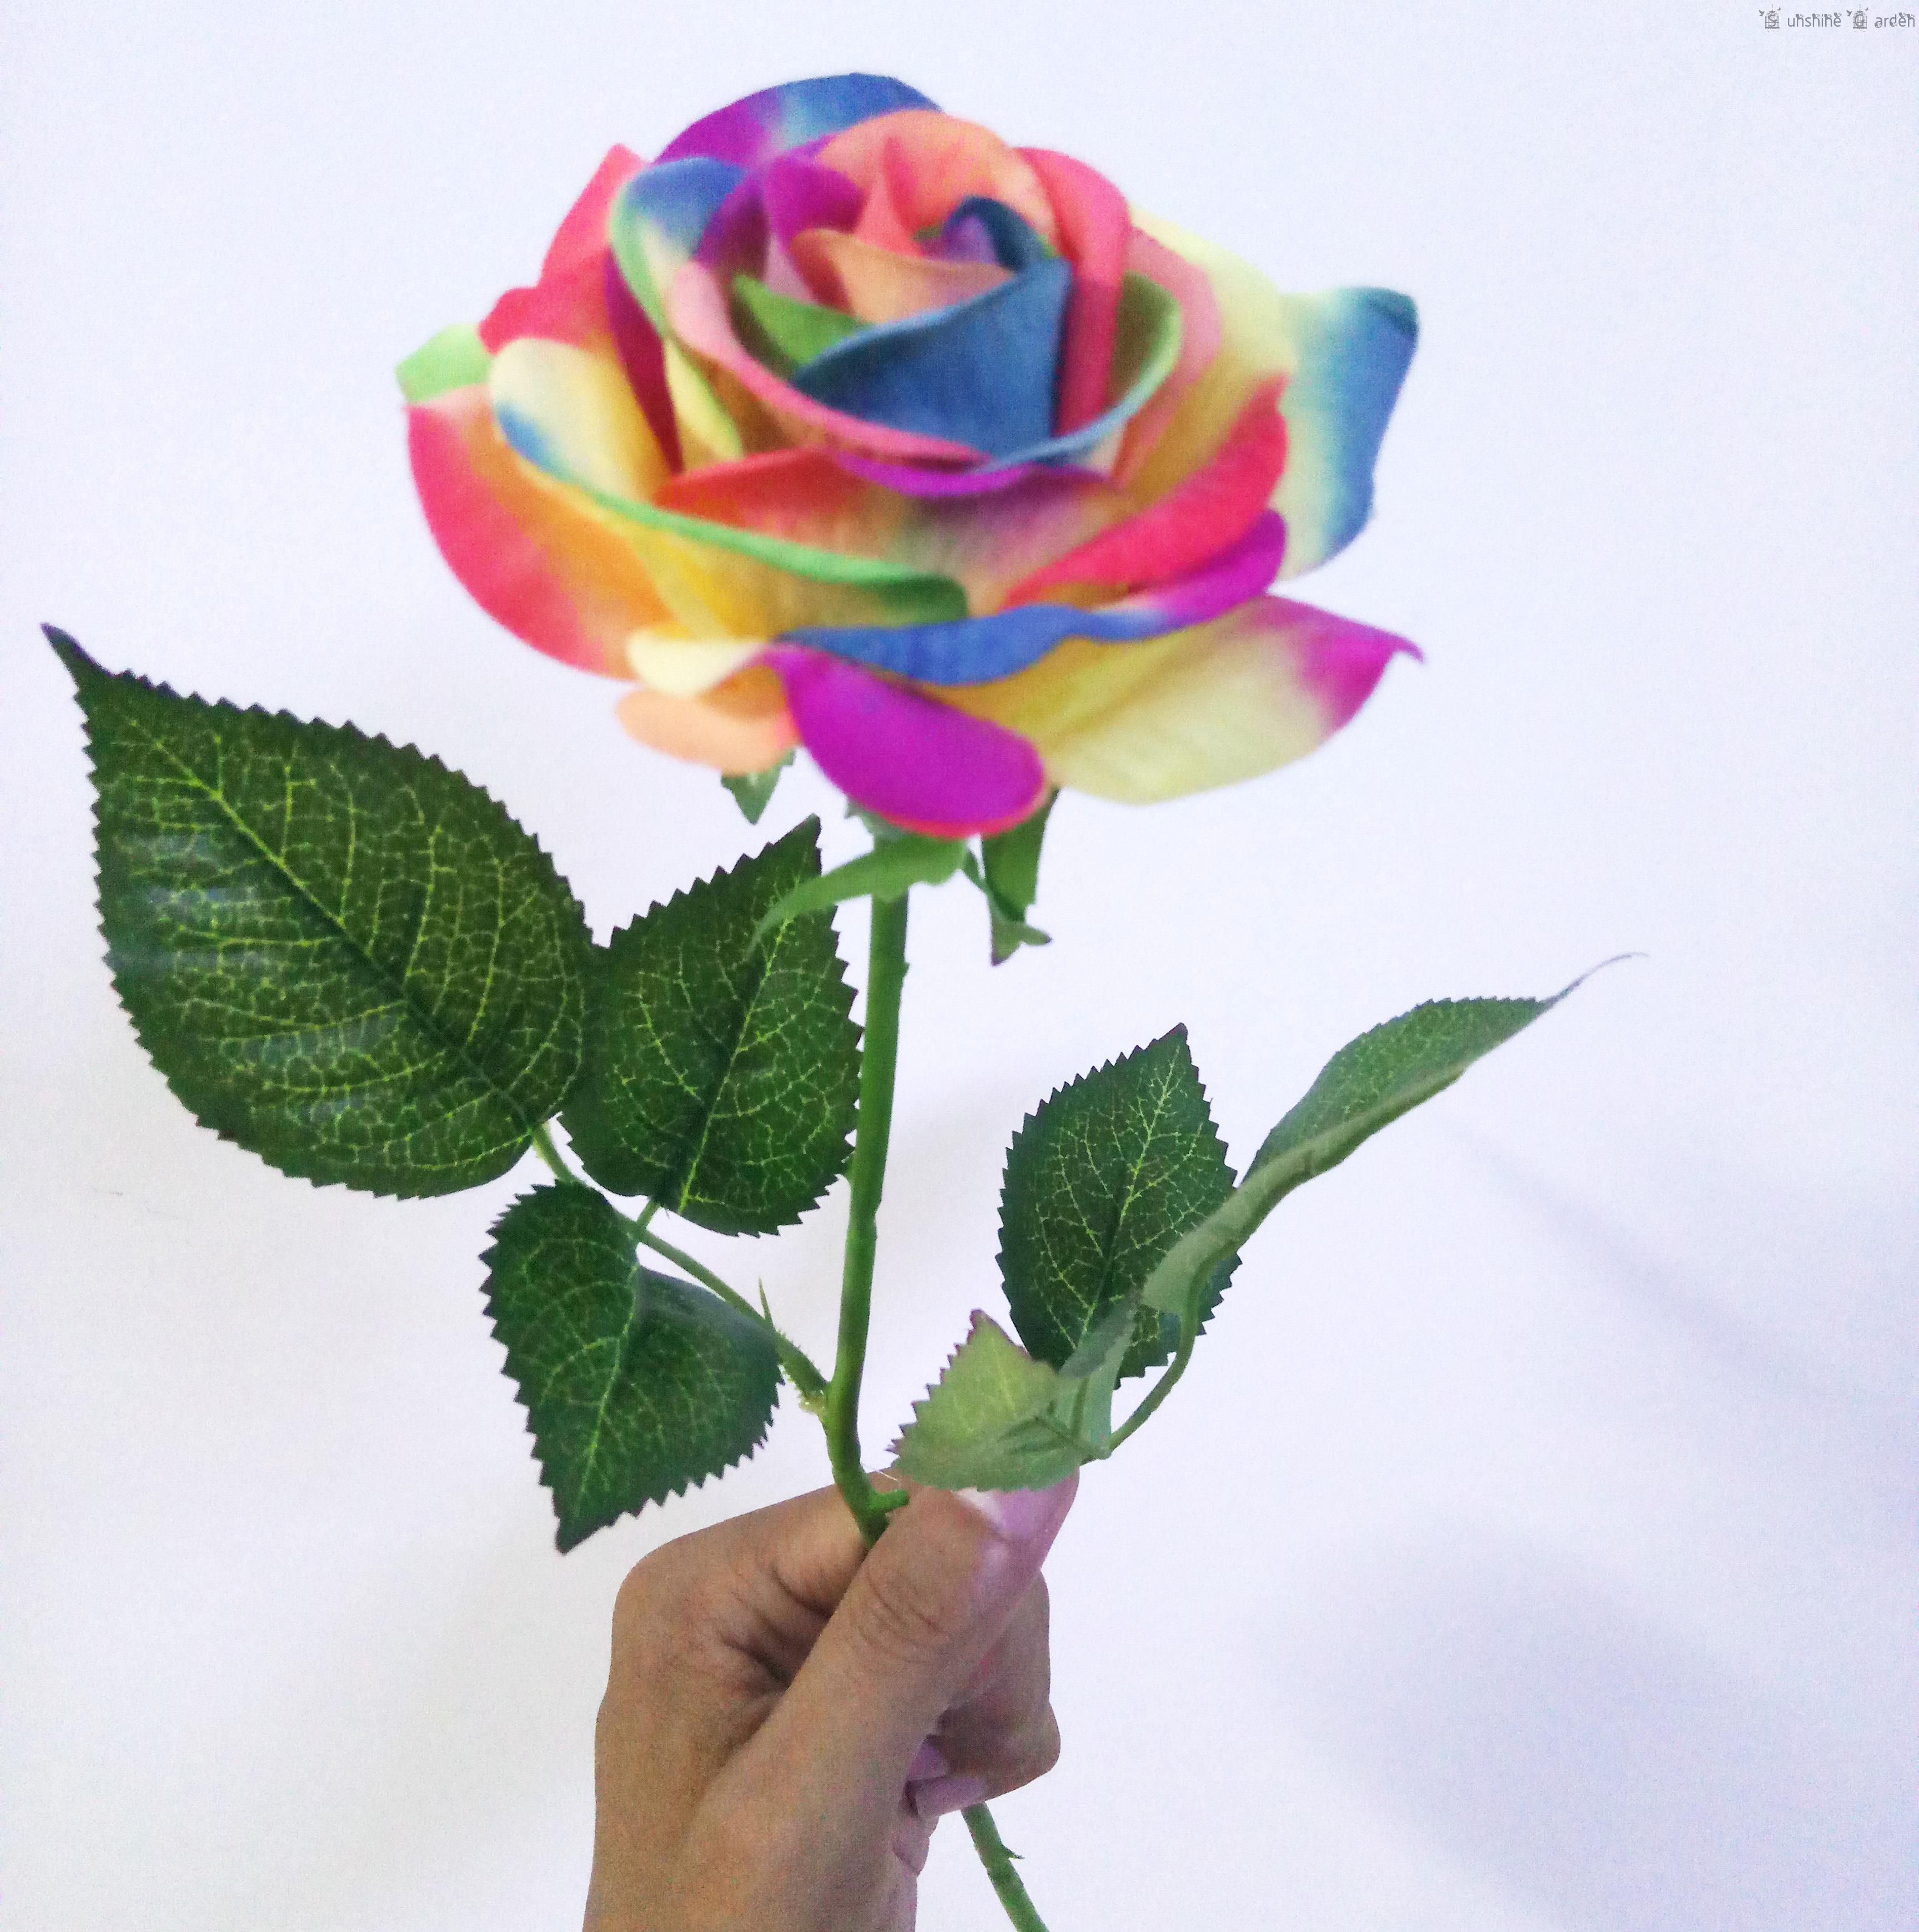 15 pcs single stem fake colorful silk flower artificial rainbow rose 15 pcs single stem fake colorful silk flower artificial rainbow rose real touch wedding home decoration gift wedding bouquets mightylinksfo